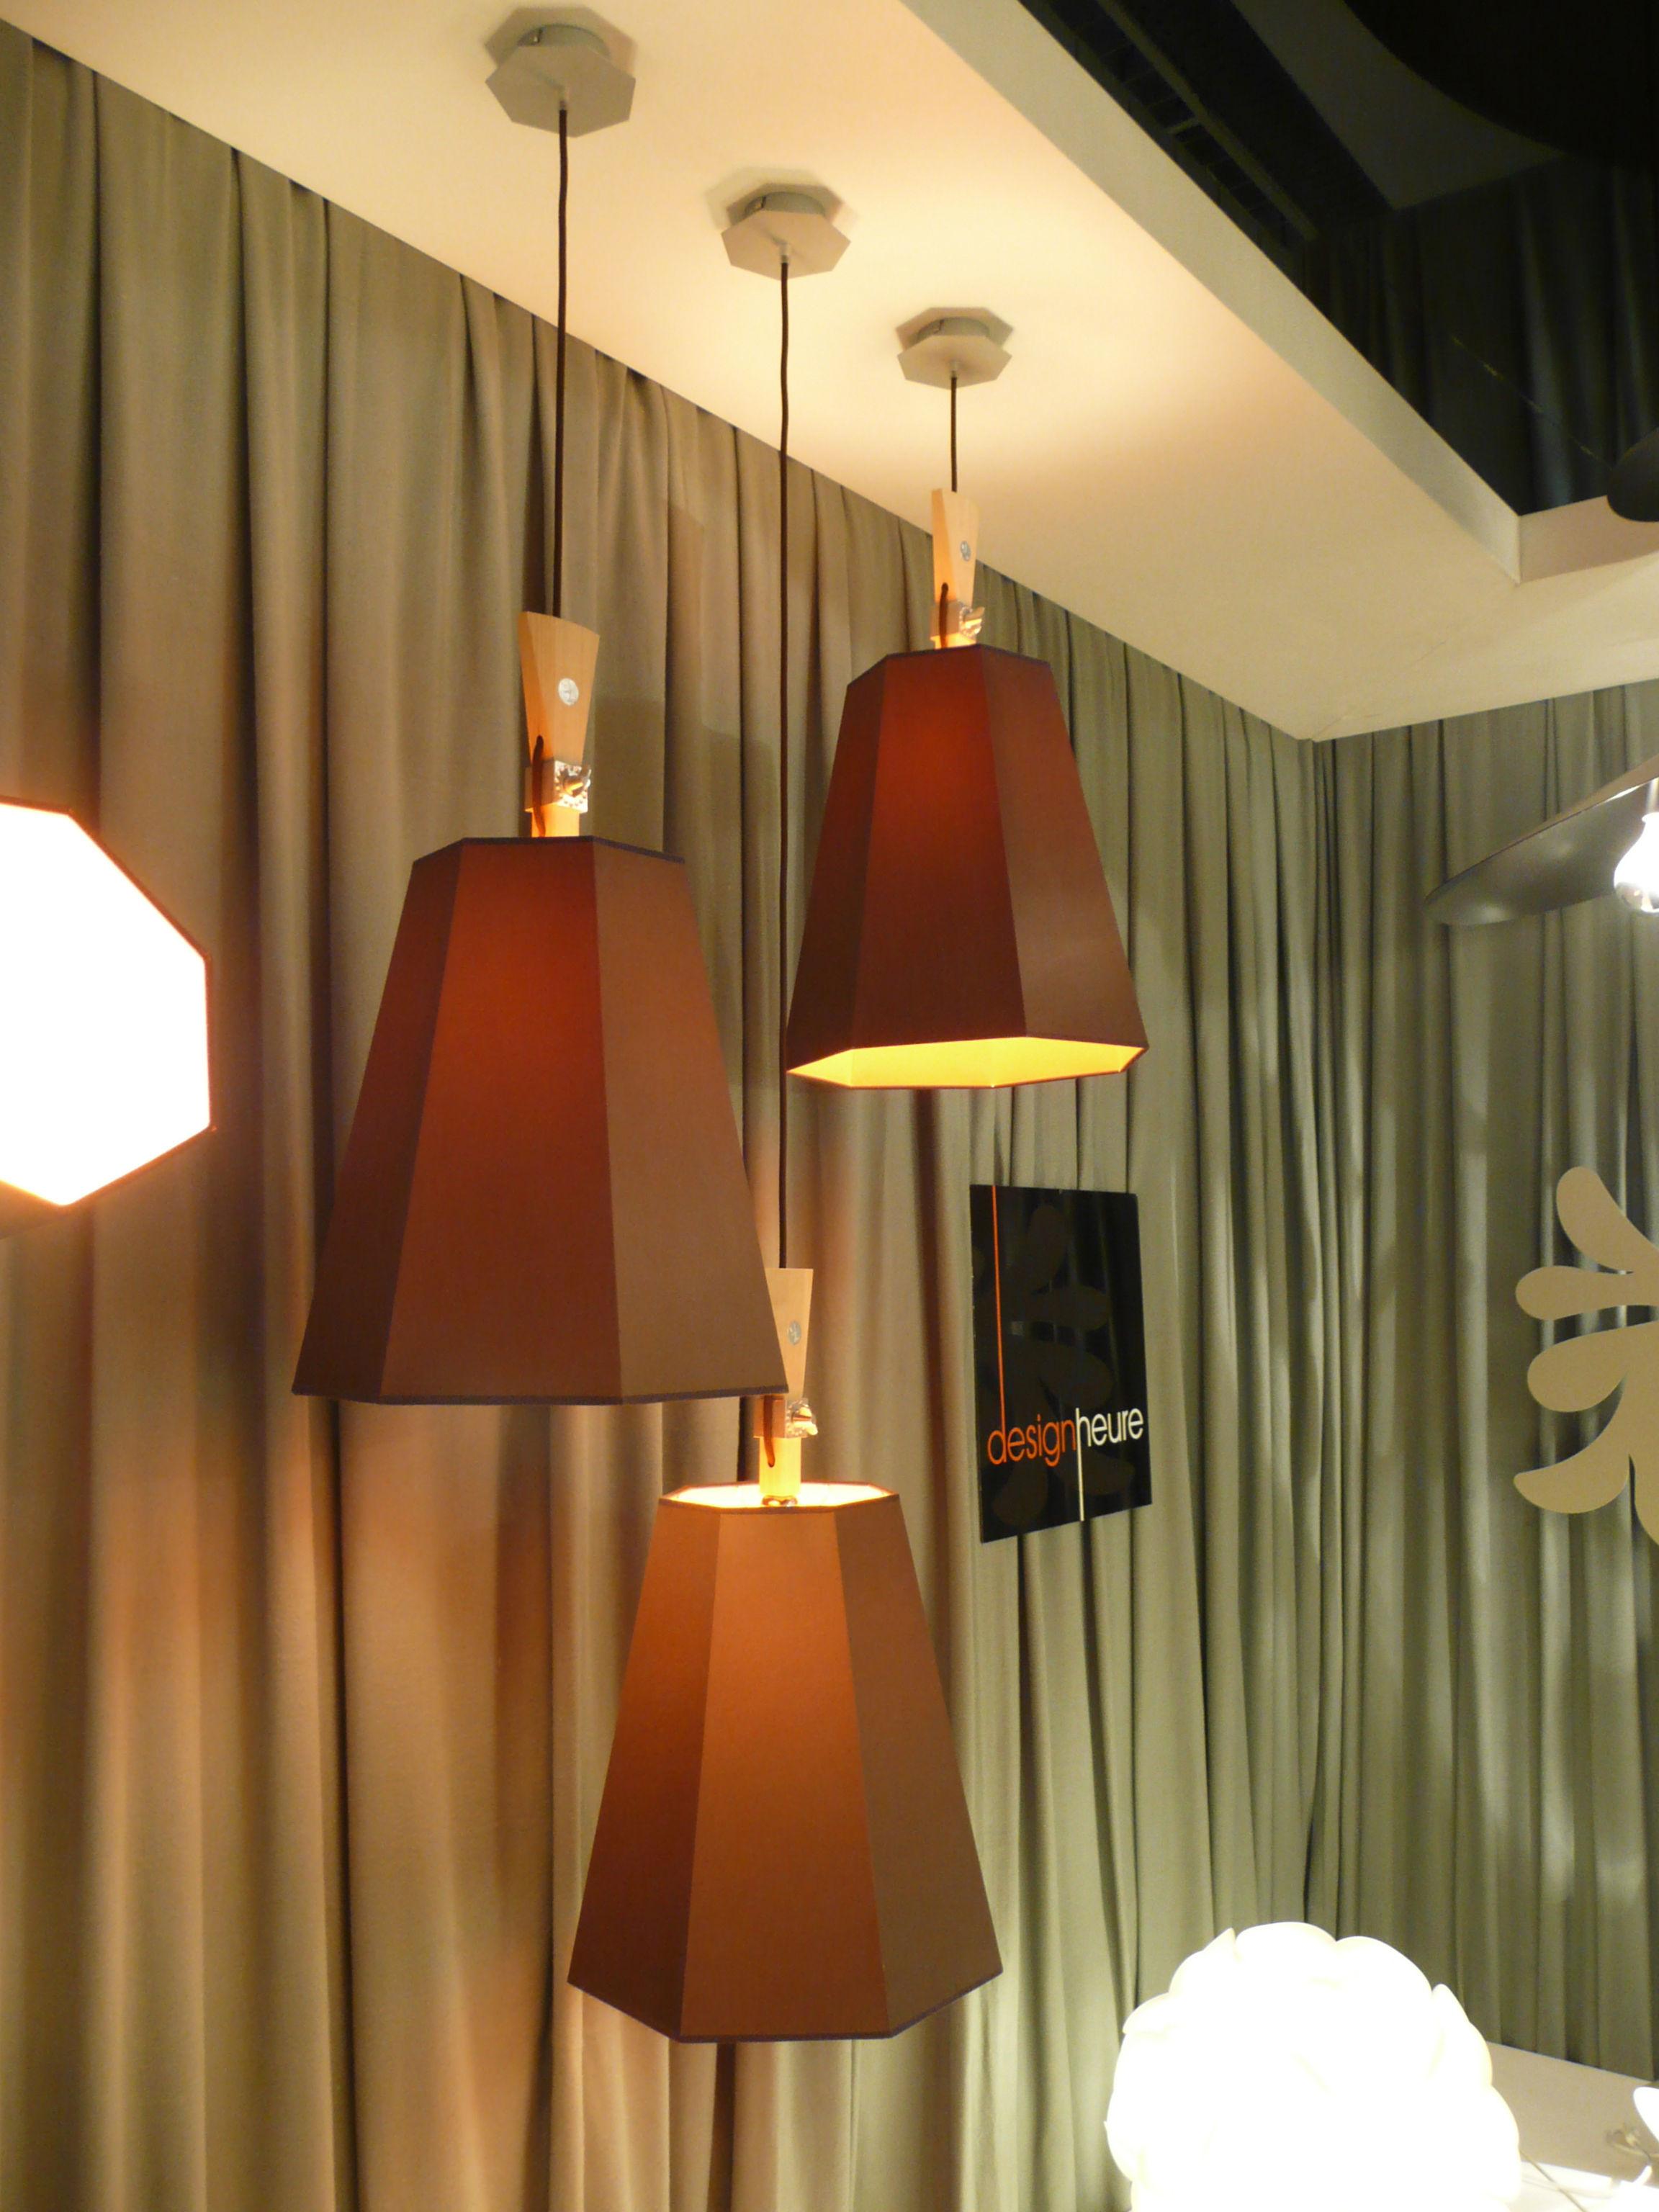 baignoire asym trique baln o baignoire asym trique baln o sur enperdresonlapin. Black Bedroom Furniture Sets. Home Design Ideas